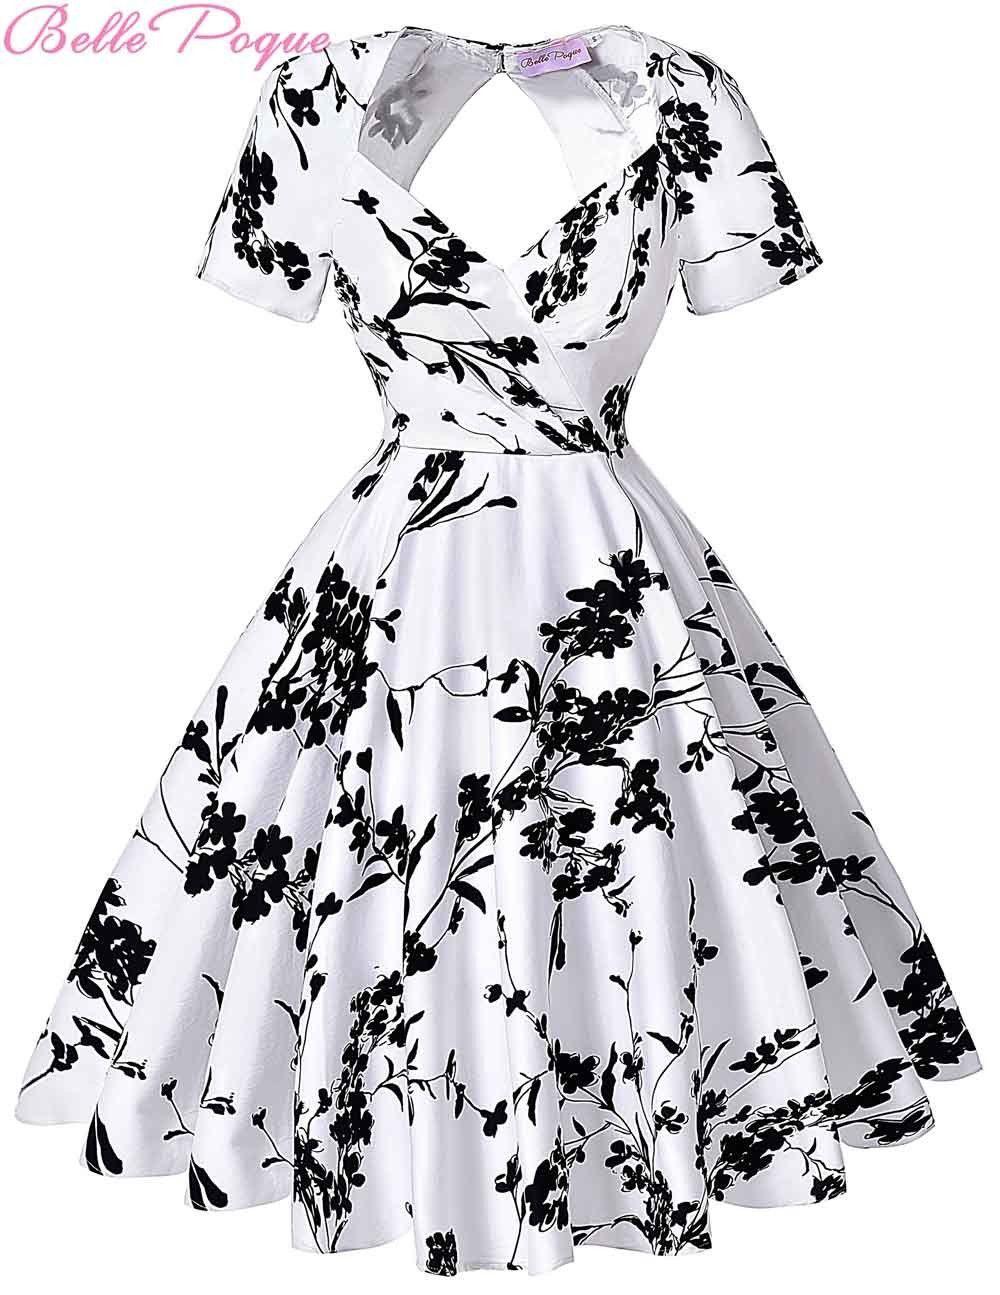 Short sleeve floral print s vintage dresses retro swing pinup